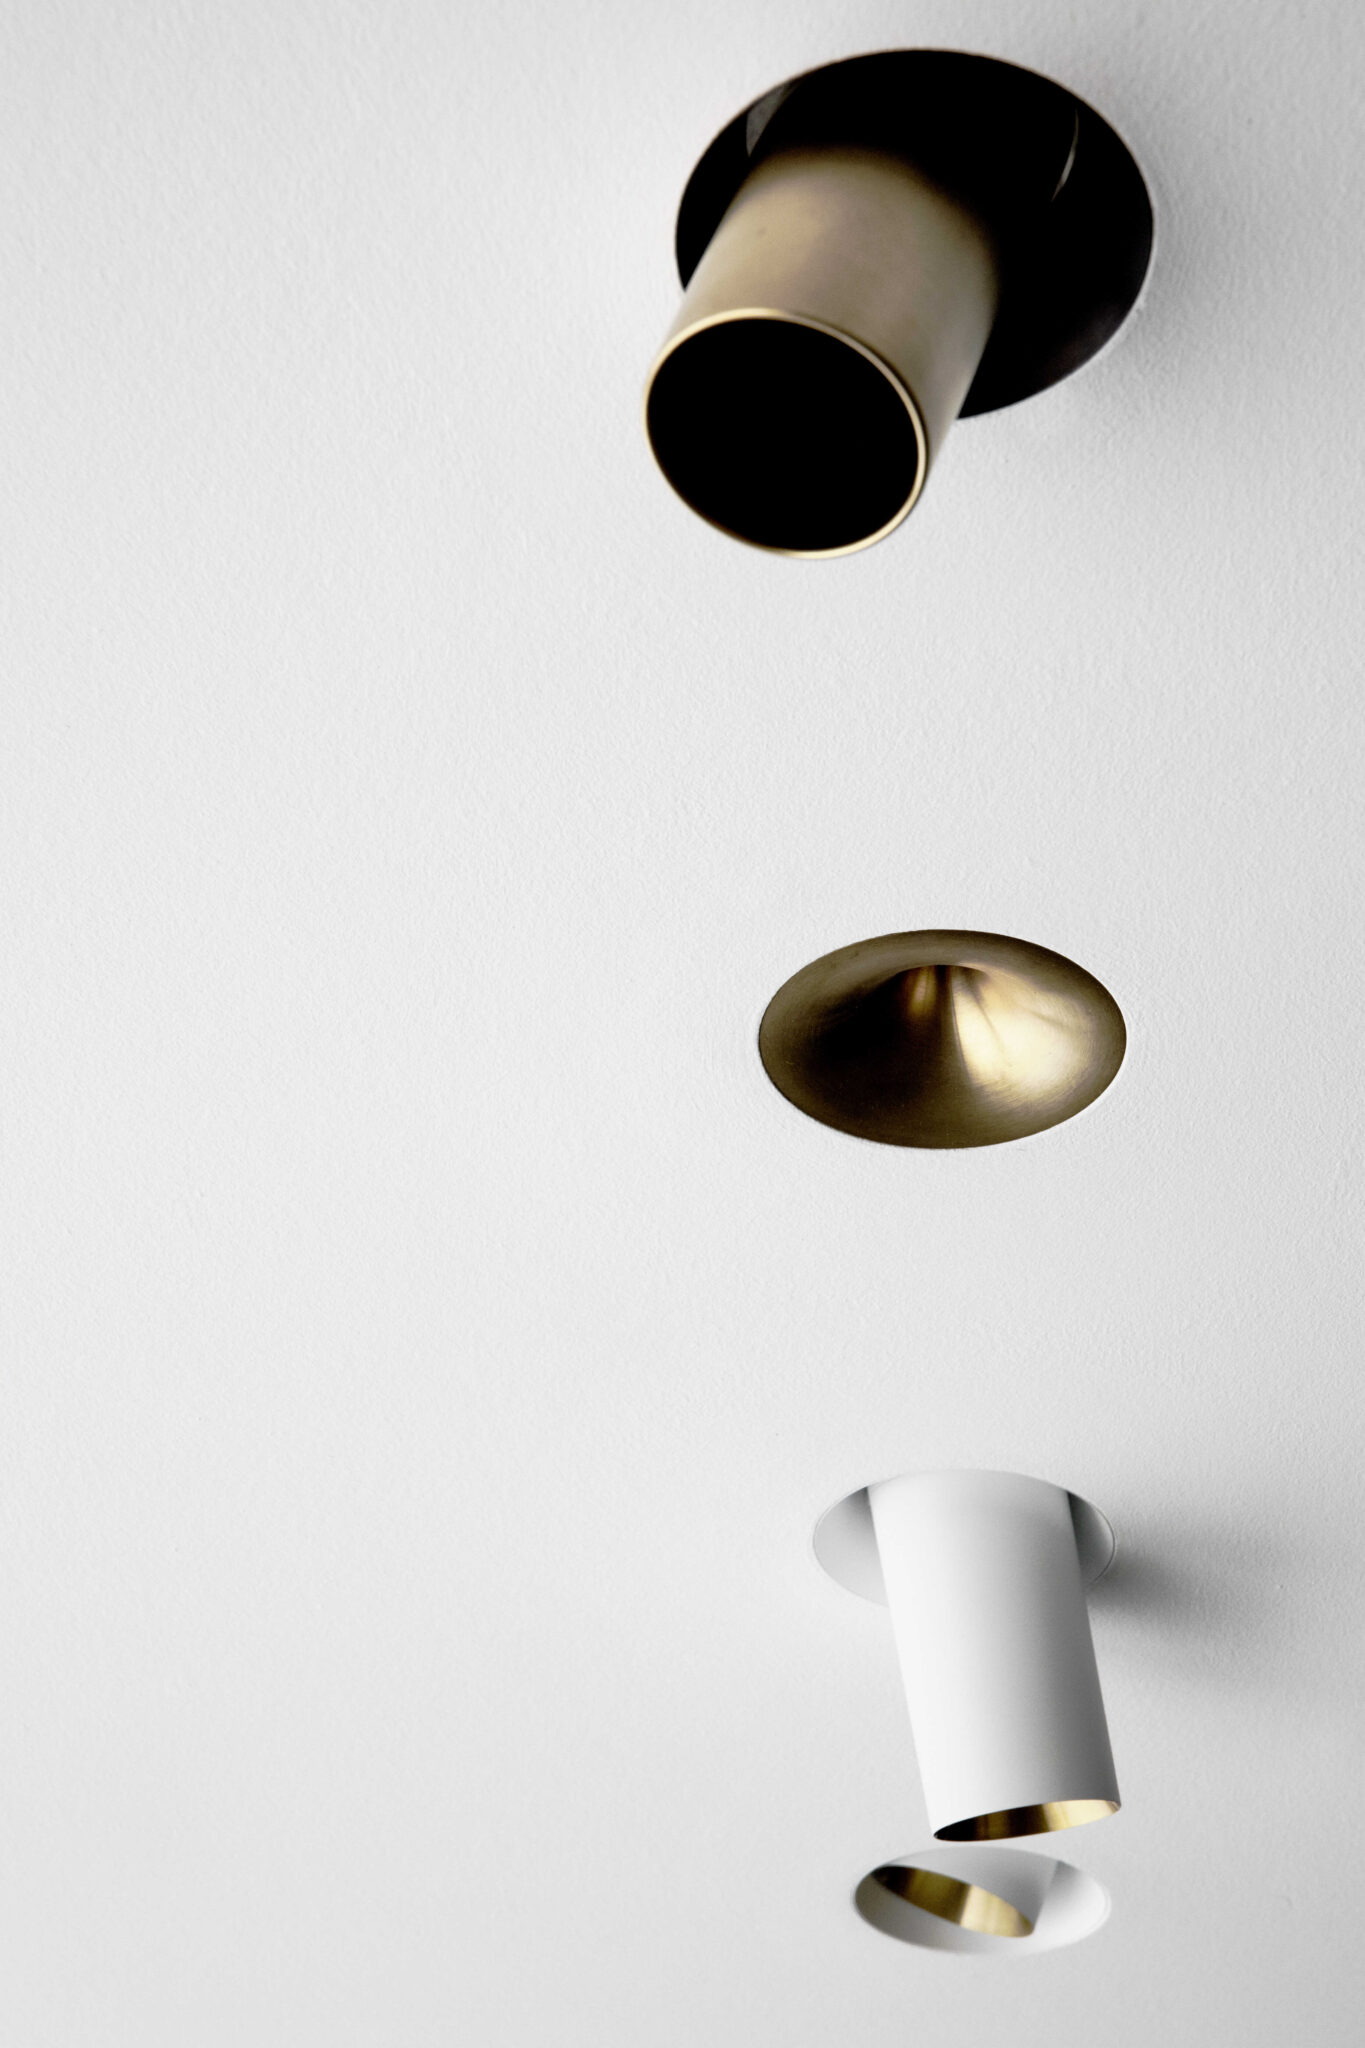 onea-storm-medium-mix-white-gold-02_optimized